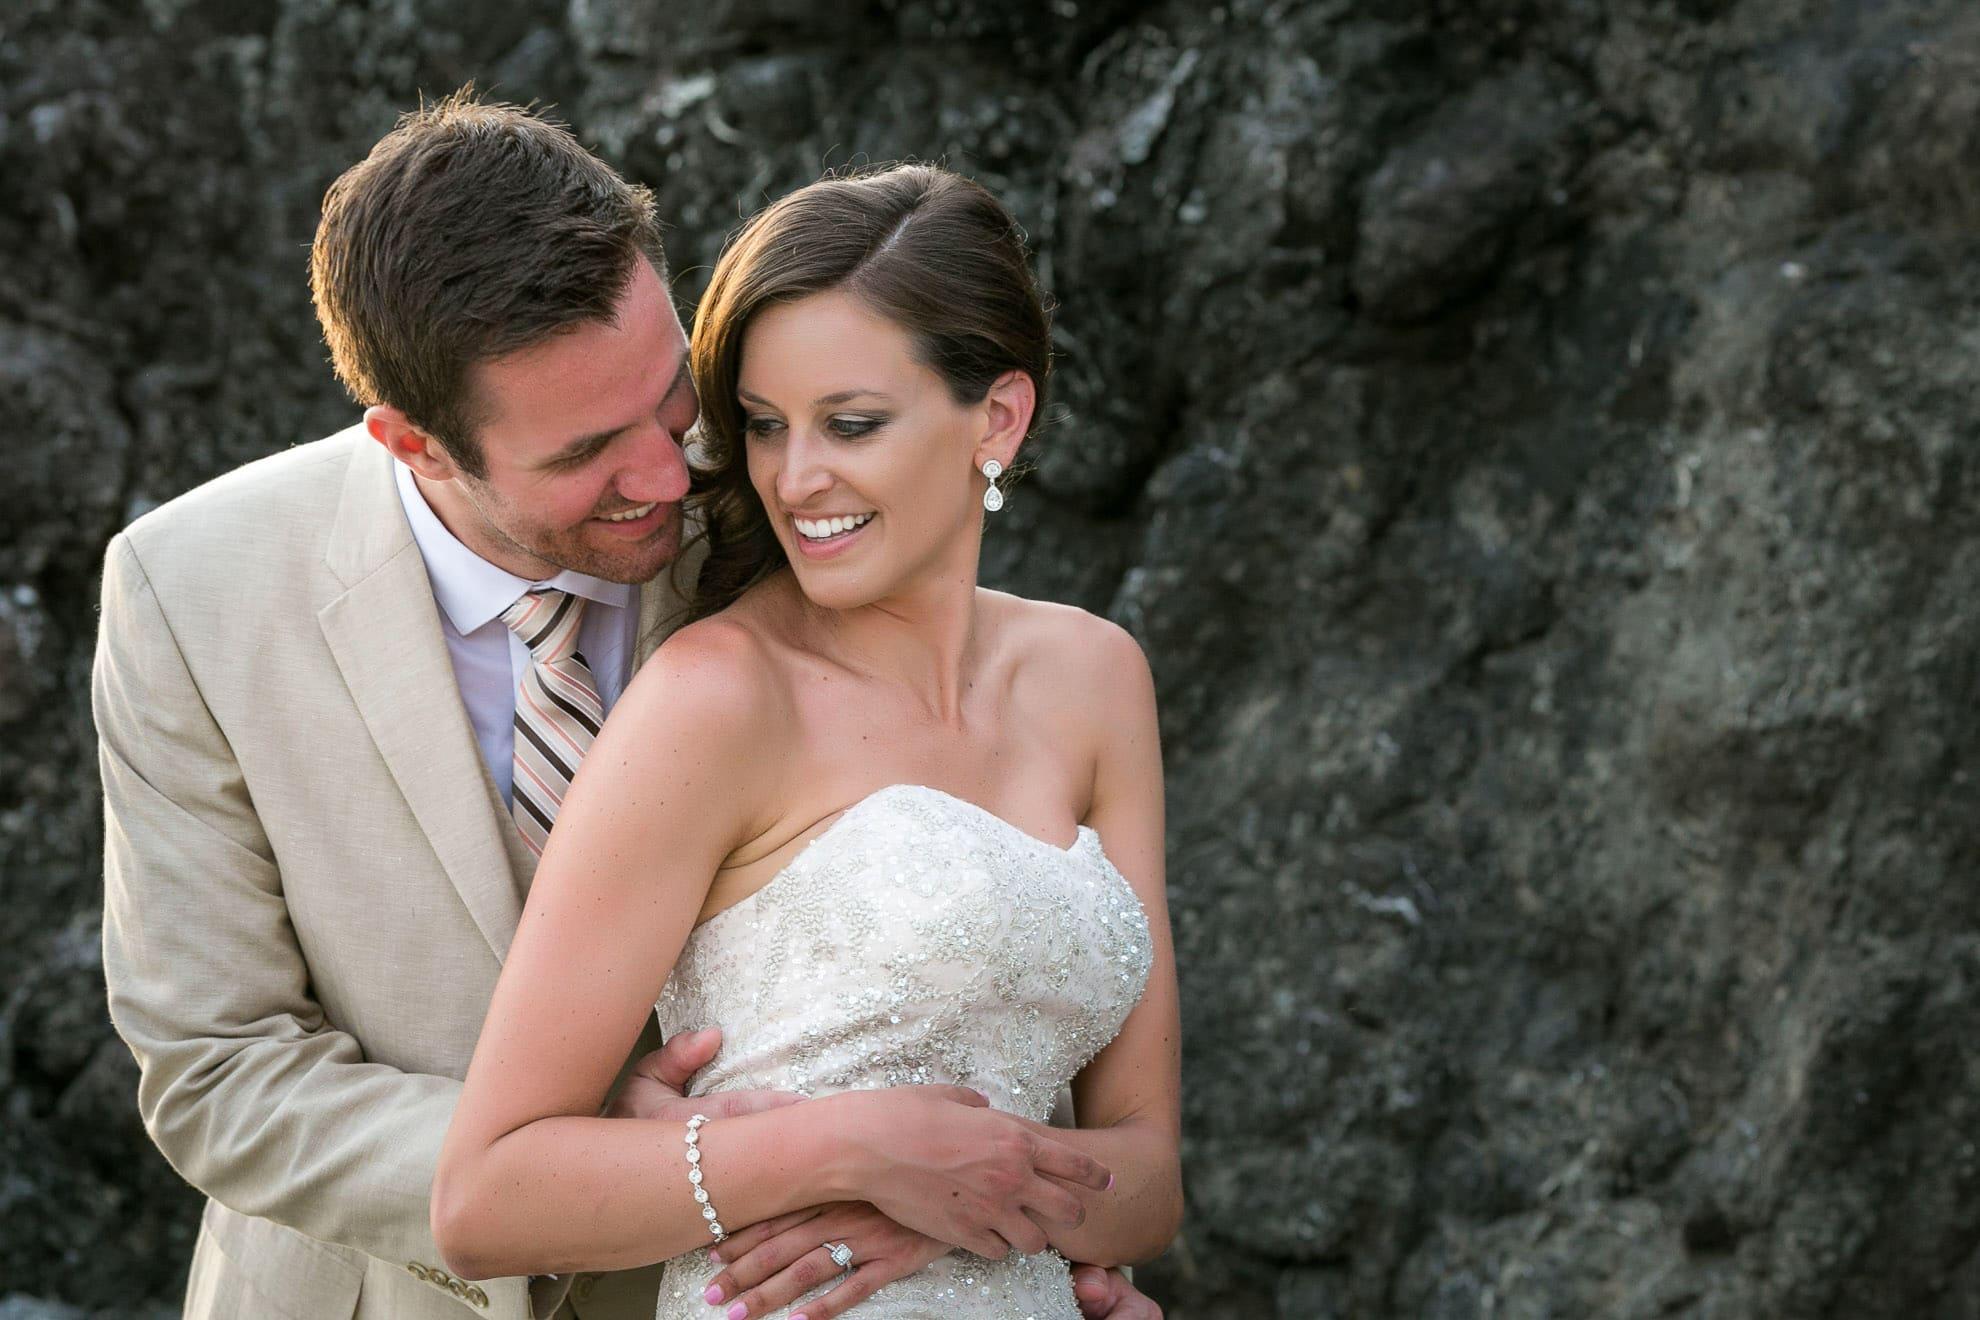 Bride and groom by National Park in Manuel Antonio